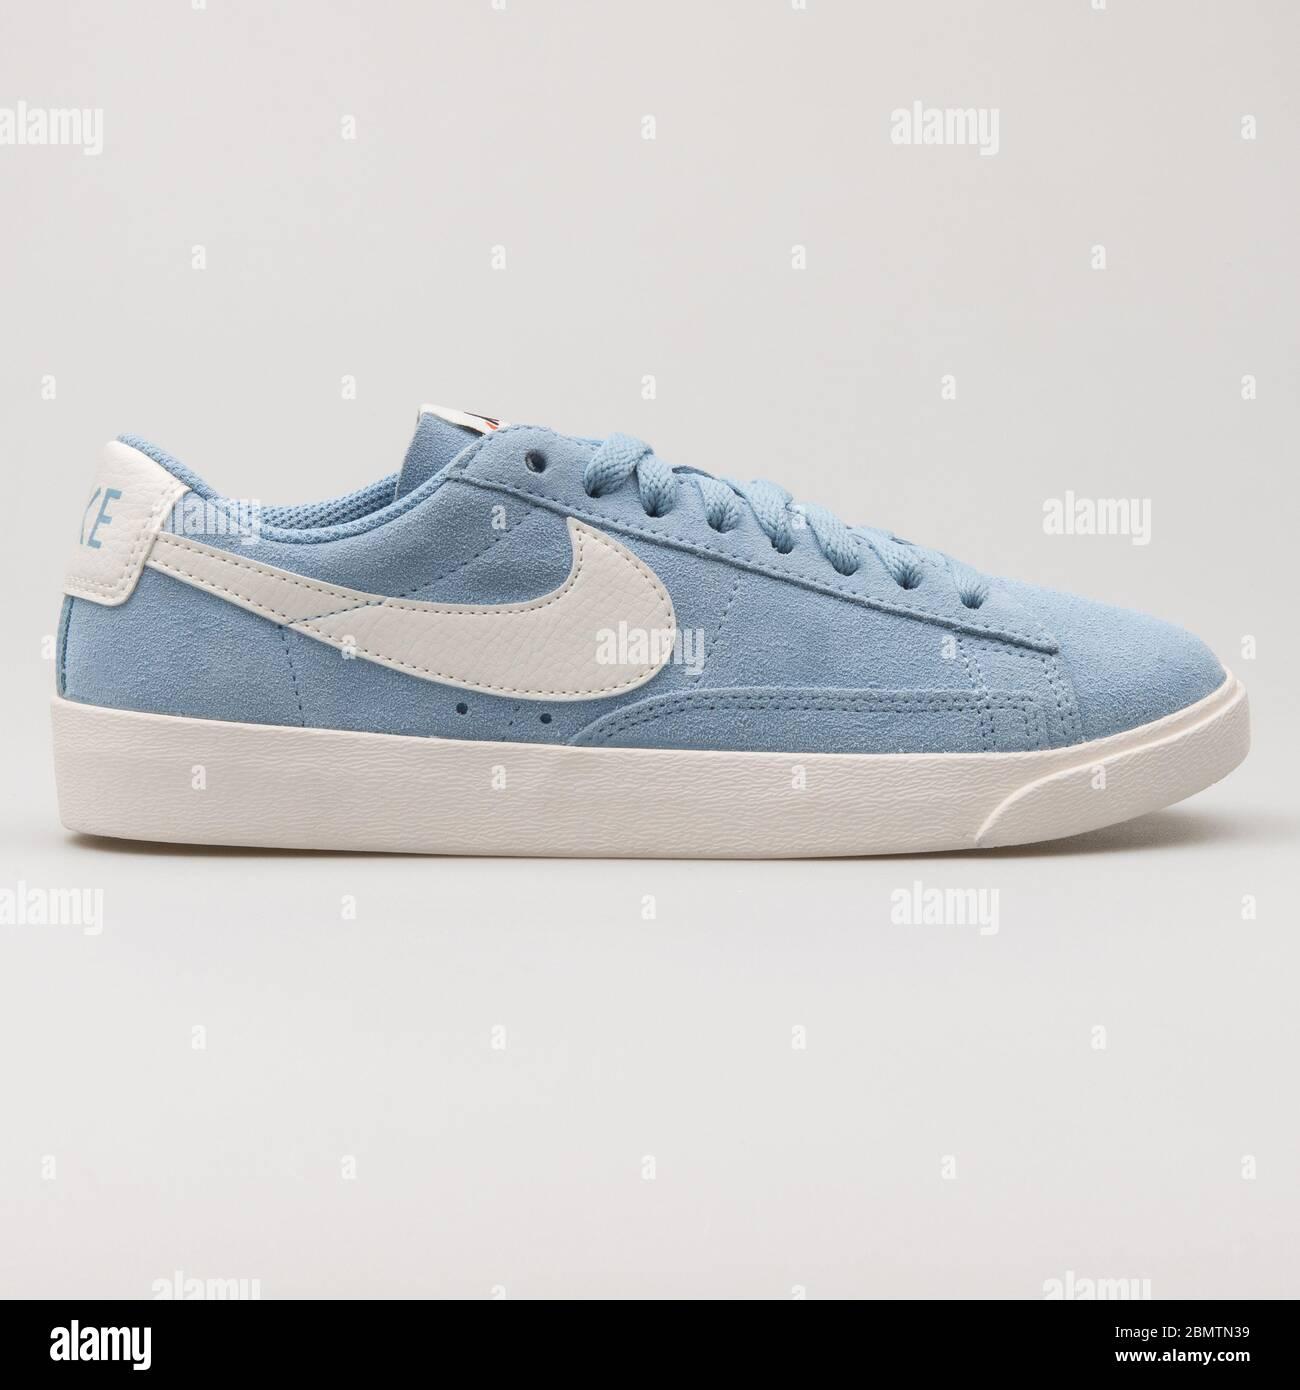 Terrible Debilidad enfermero  VIENNA, AUSTRIA - FEBRUARY 19, 2018: Nike Blazer Low Suede light blue and  white sneaker on white background Stock Photo - Alamy